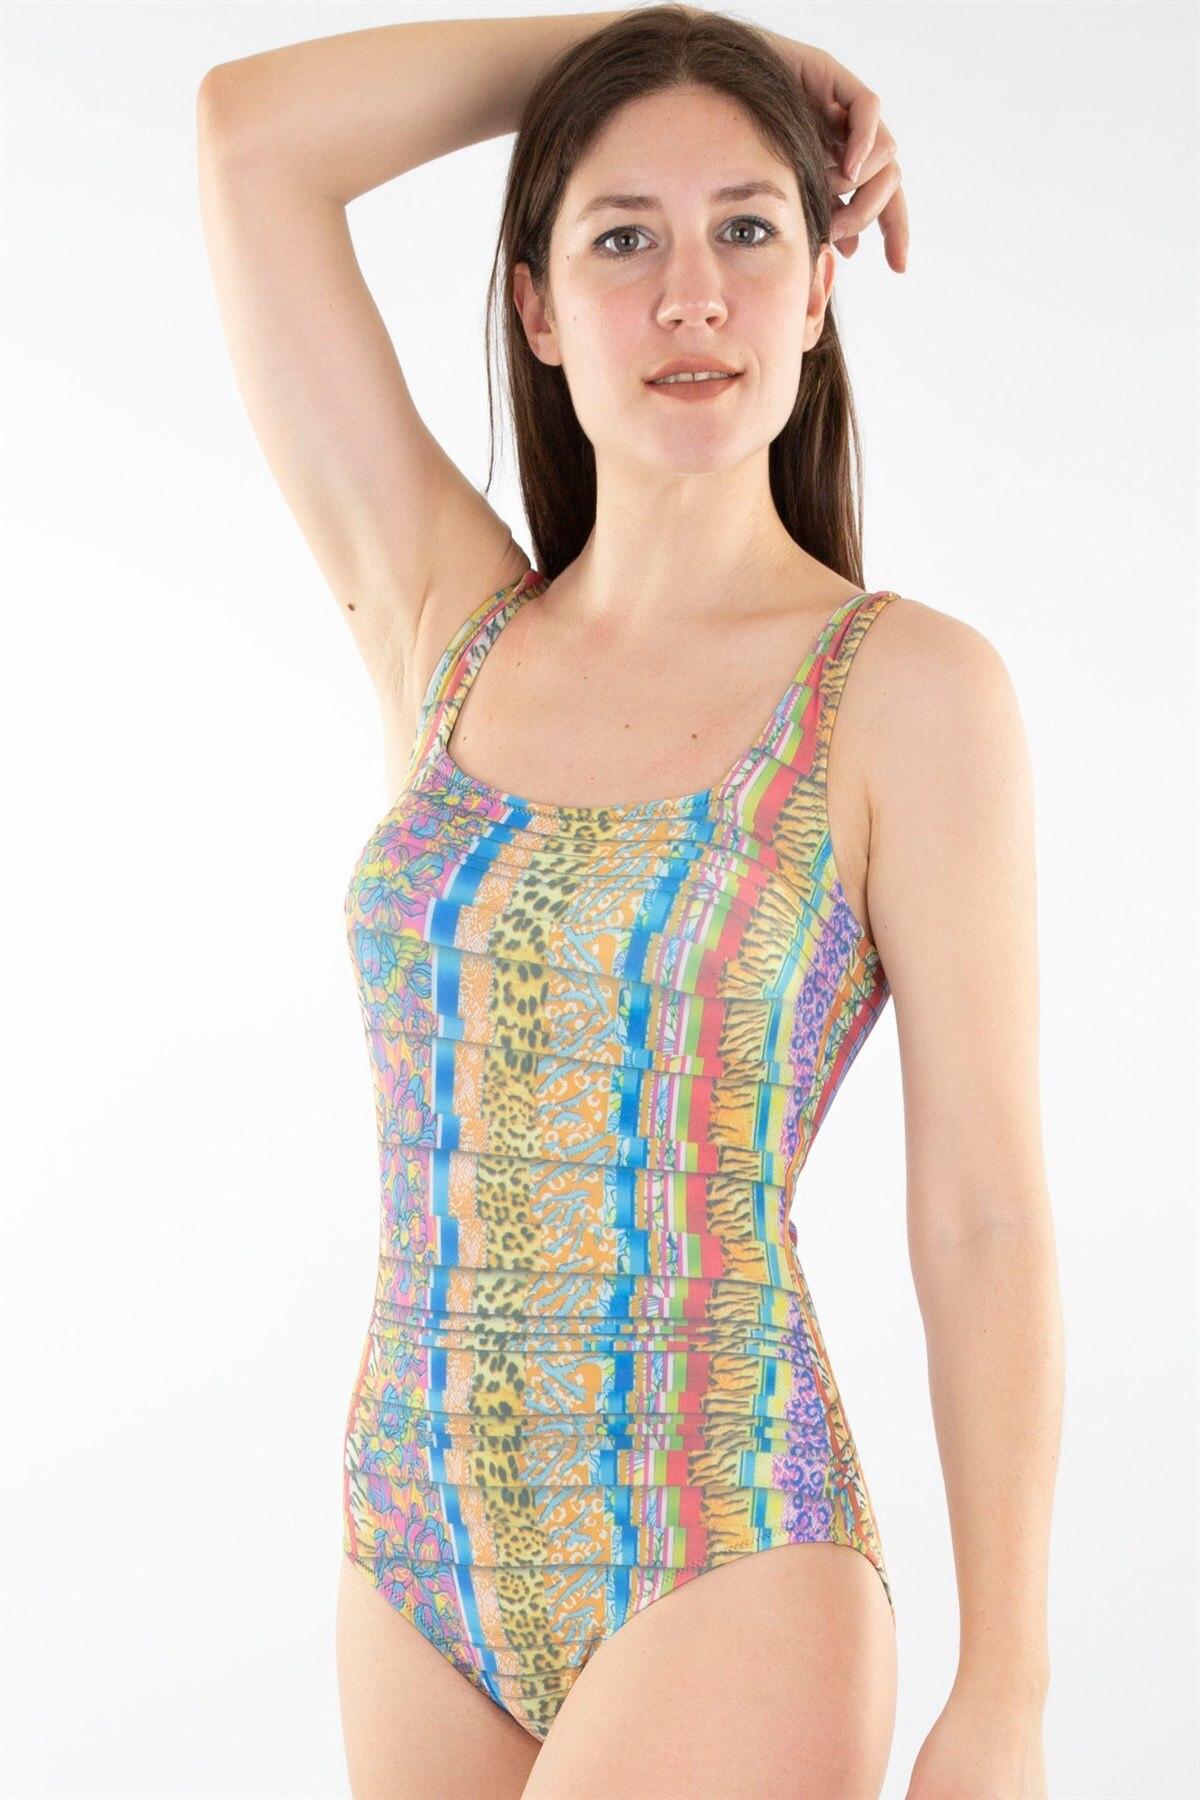 Fashion Cartoon Multi-Color Swimwear 25365